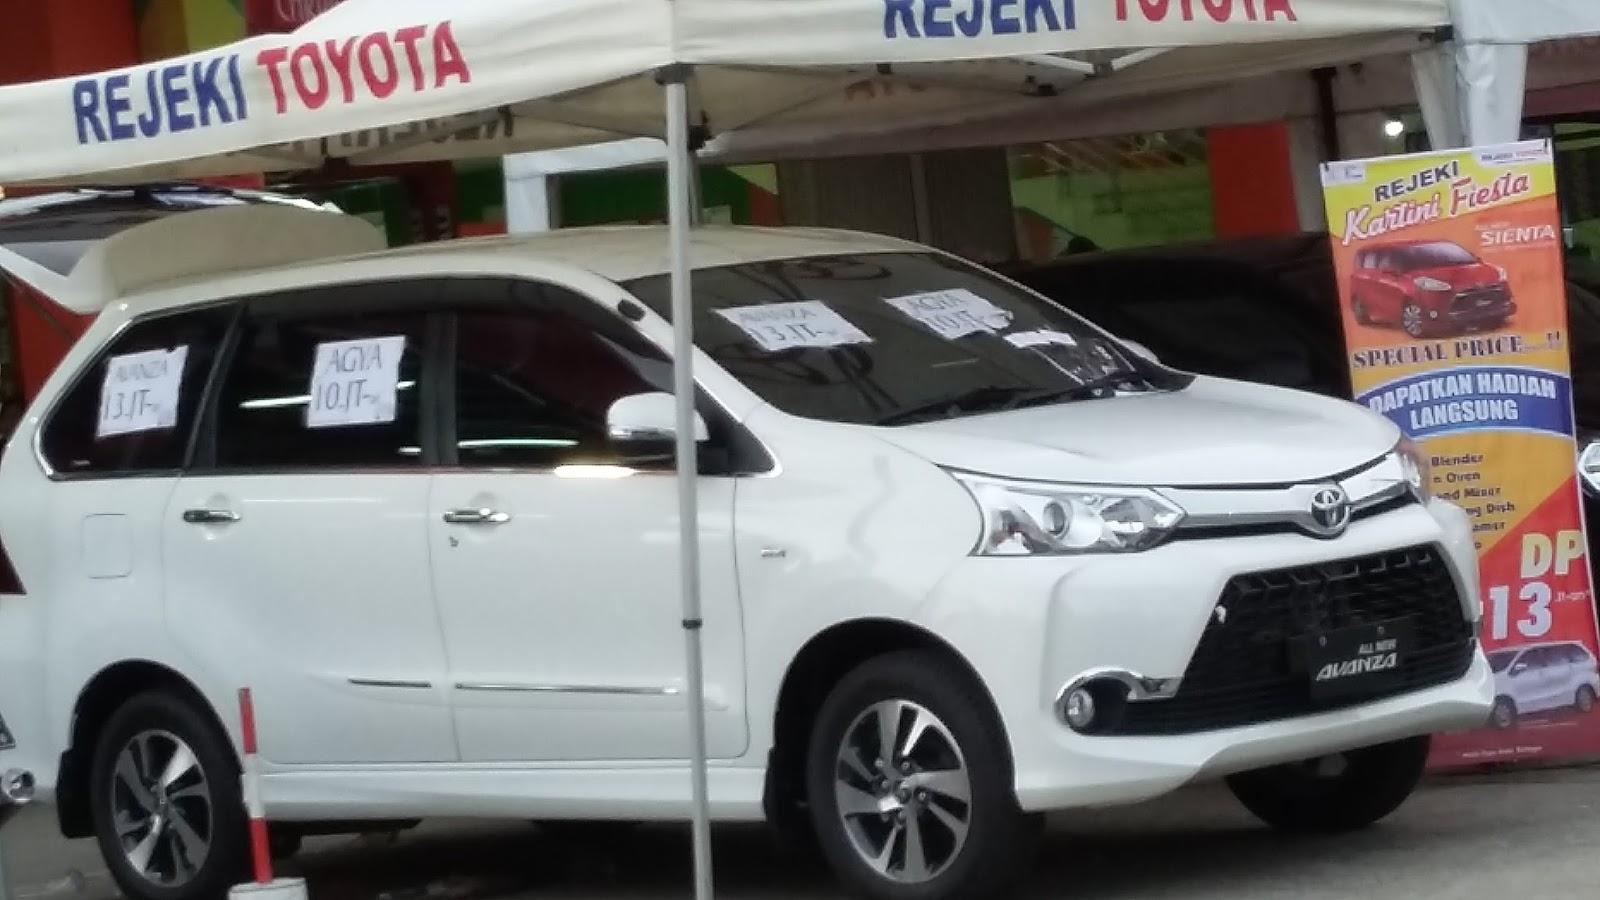 Harga Grand All New Avanza 2016 Kijang Innova Crysta Guntur Sapta Kredit Mobil Indramayu Dp